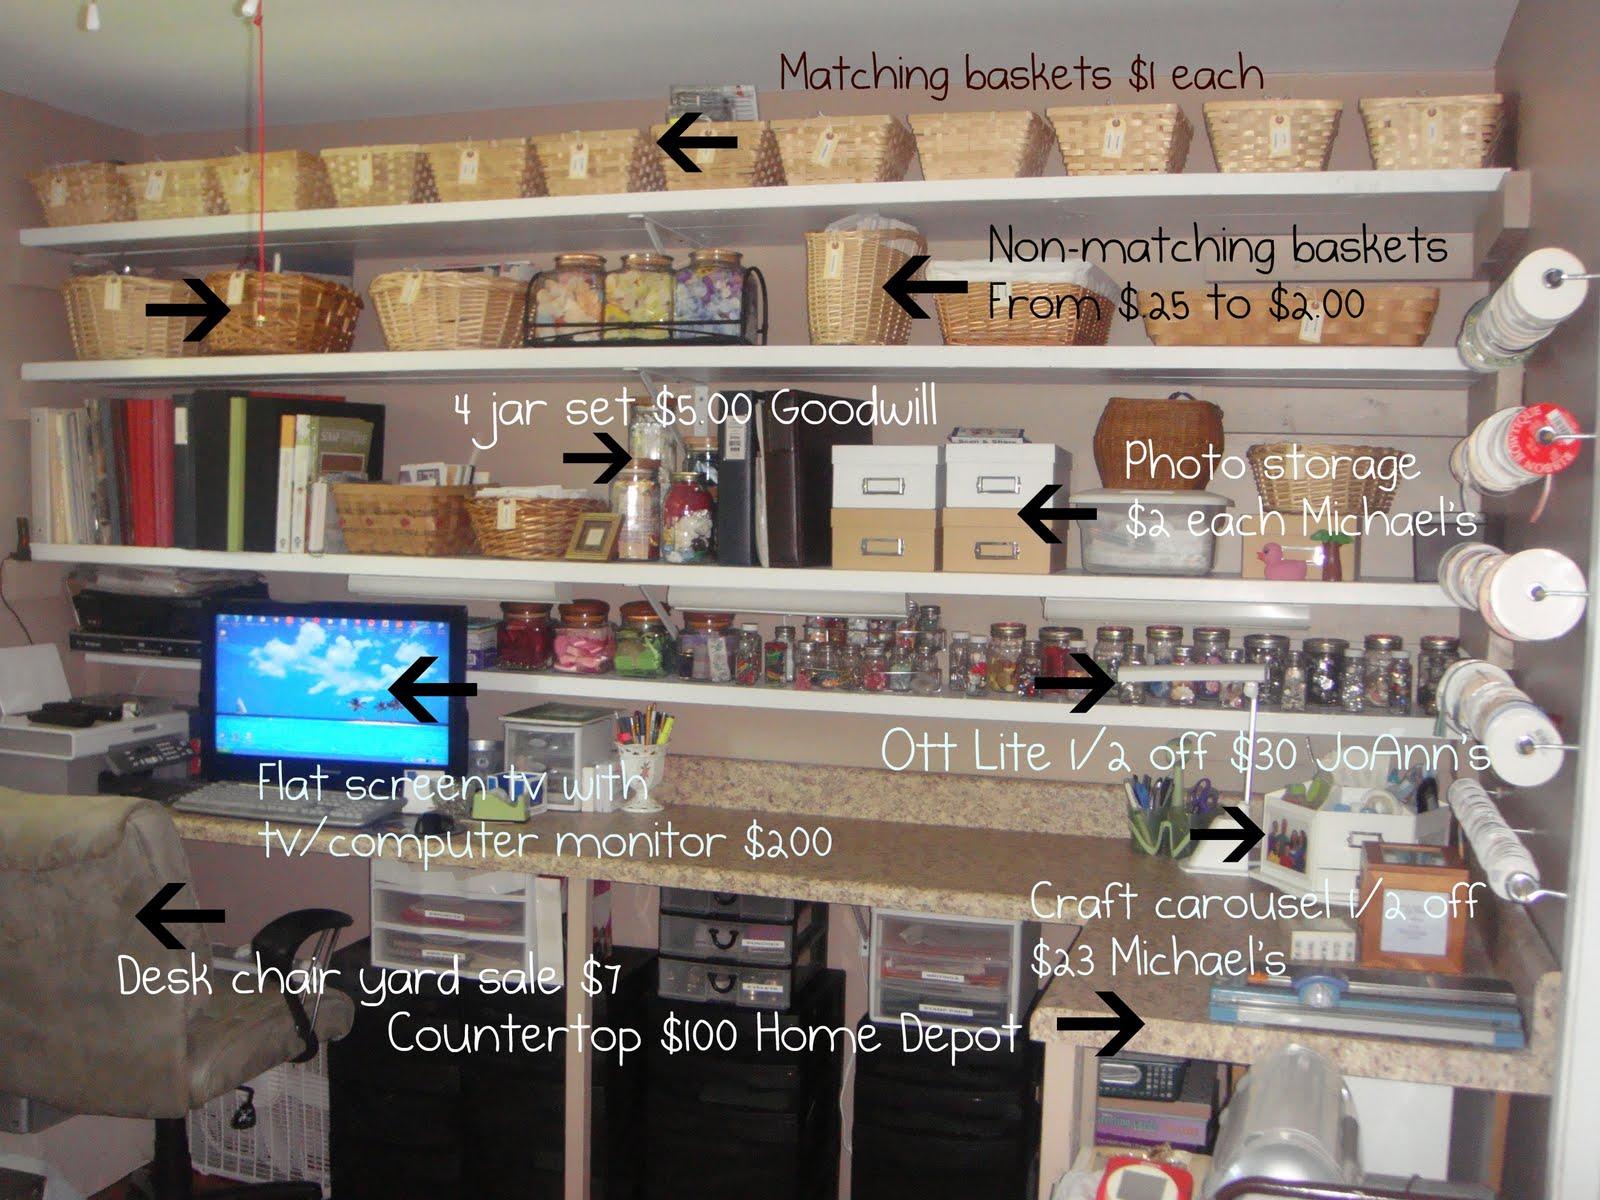 Scrapbook ideas cheap - Scrapbook Ideas Cheap 72